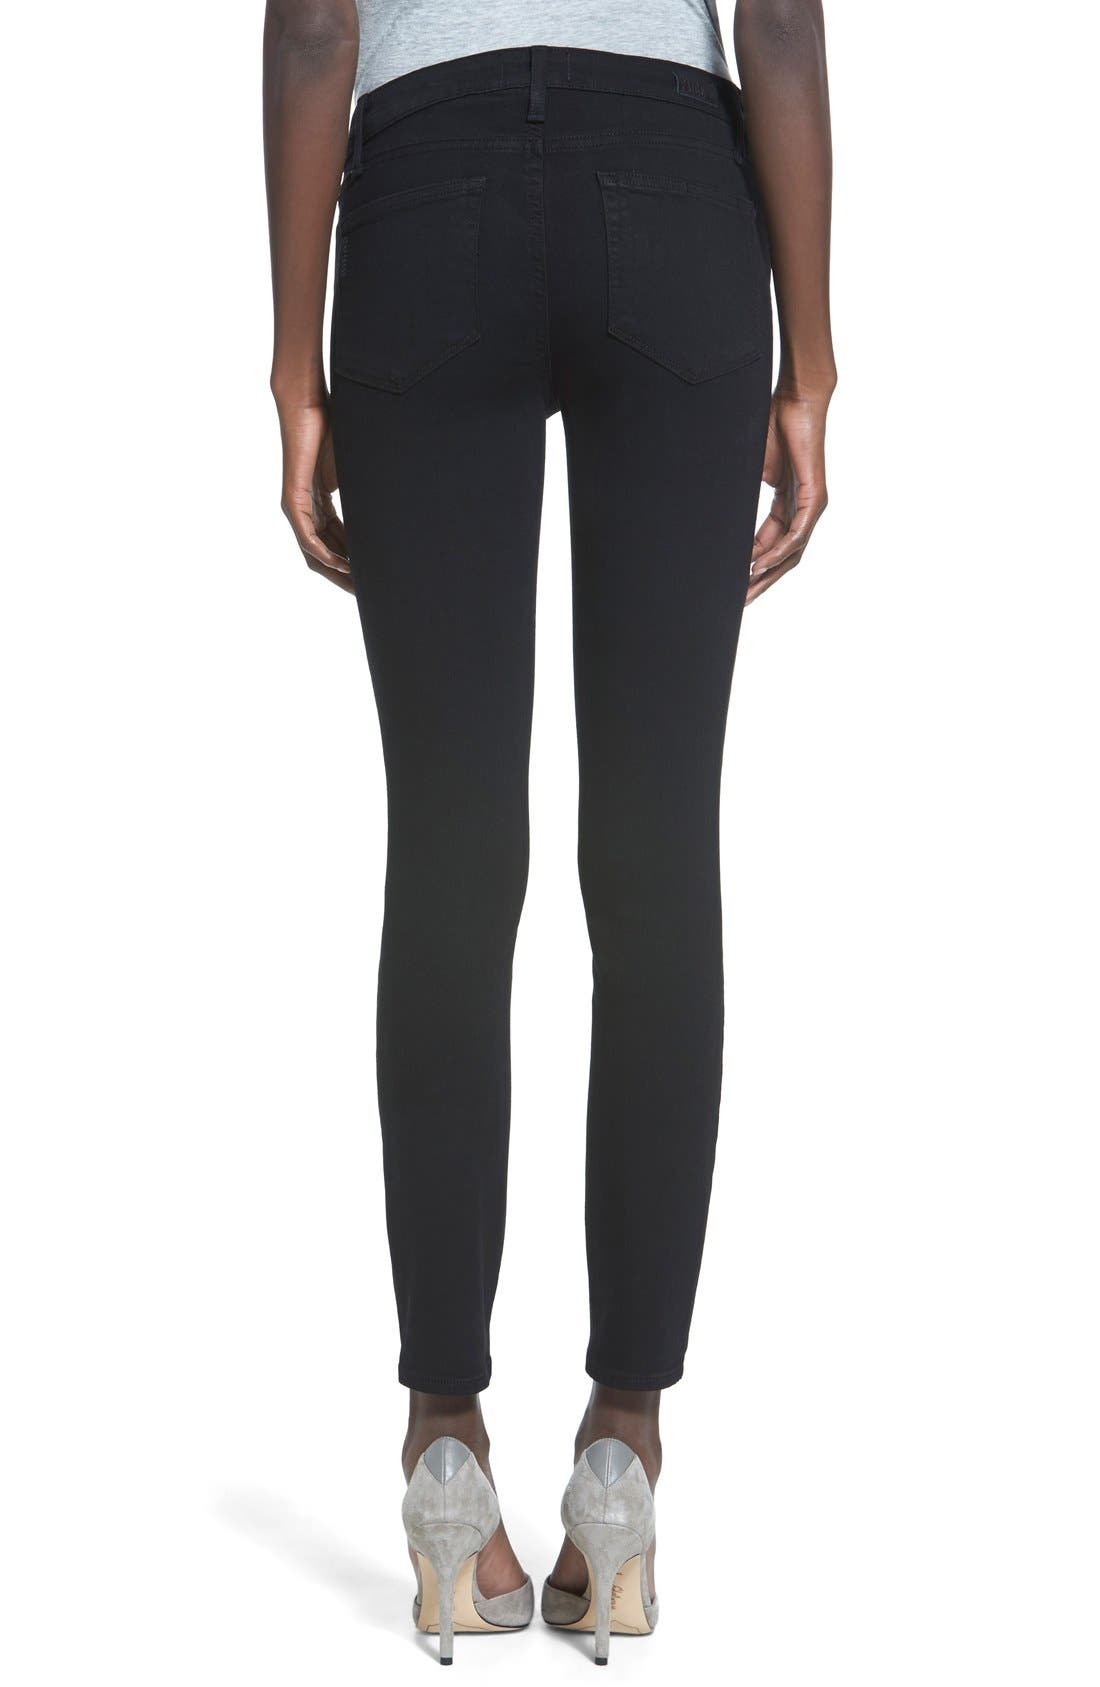 Transcend - Verdugo Ankle Ultra Skinny Jeans,                             Alternate thumbnail 2, color,                             Black Shadow